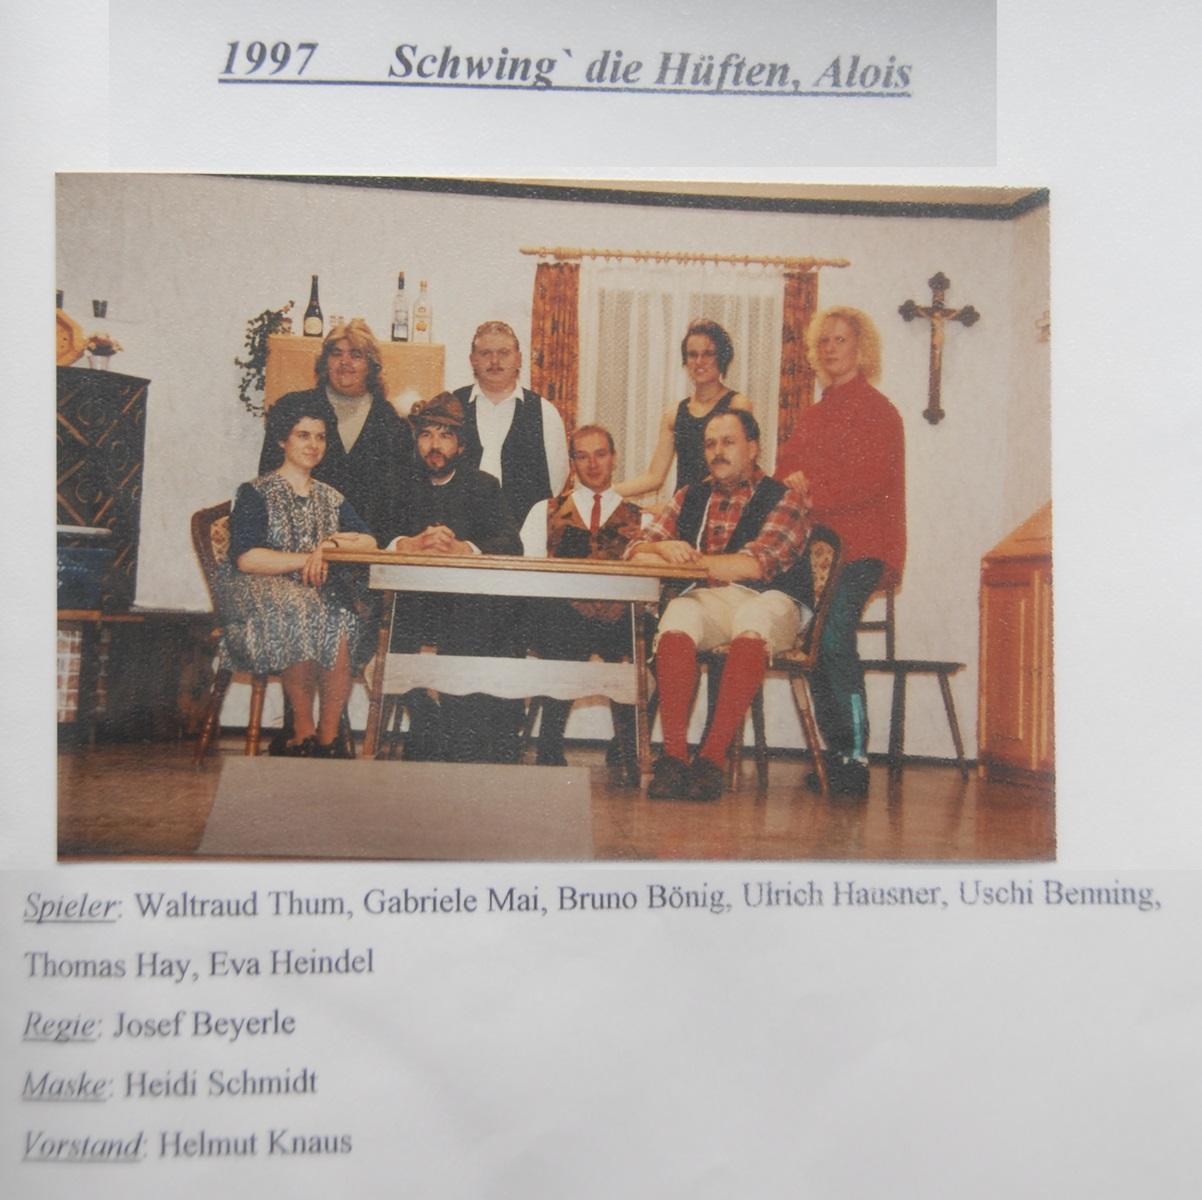 KSC-Theater-1997-Schwing-die-Hueften-Alois